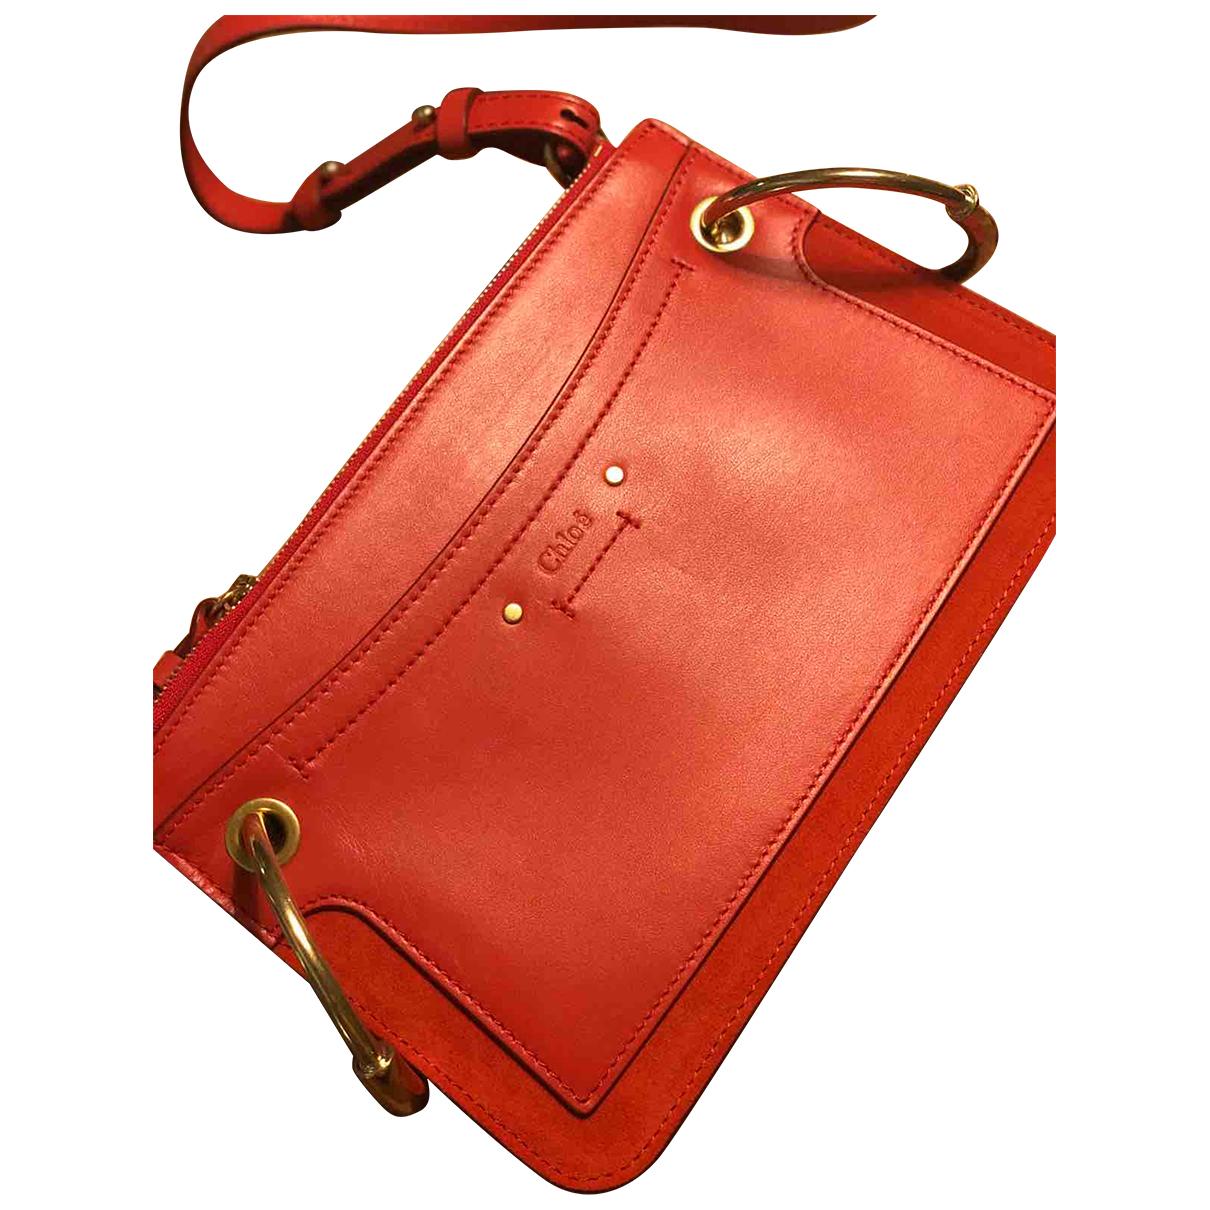 Chloe Roy Handtasche in  Rot Leder